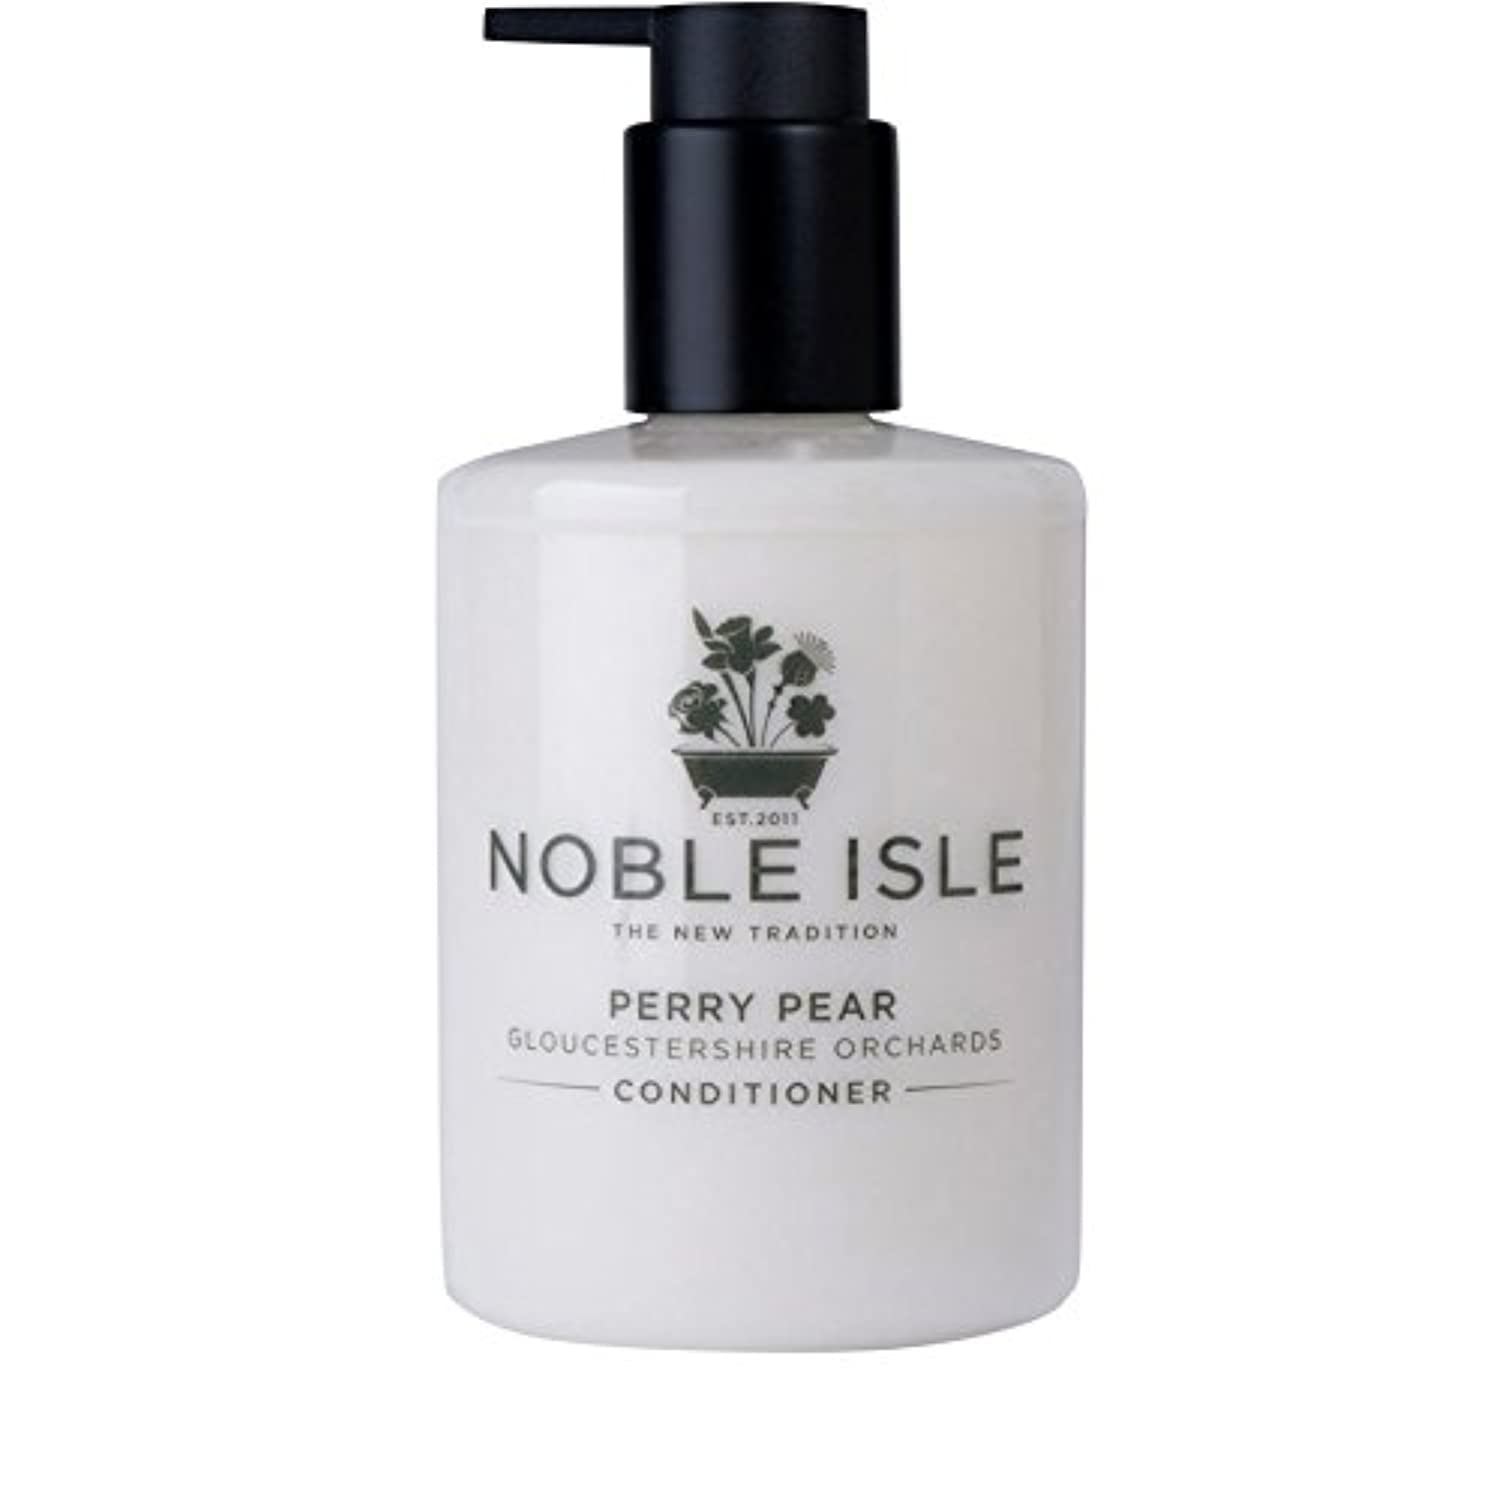 Noble Isle Perry Pear Gloucestershire Orchards Conditioner 250ml - 高貴な島ペリー梨グロスターシャー州の果樹園コンディショナー250ミリリットル [並行輸入品]